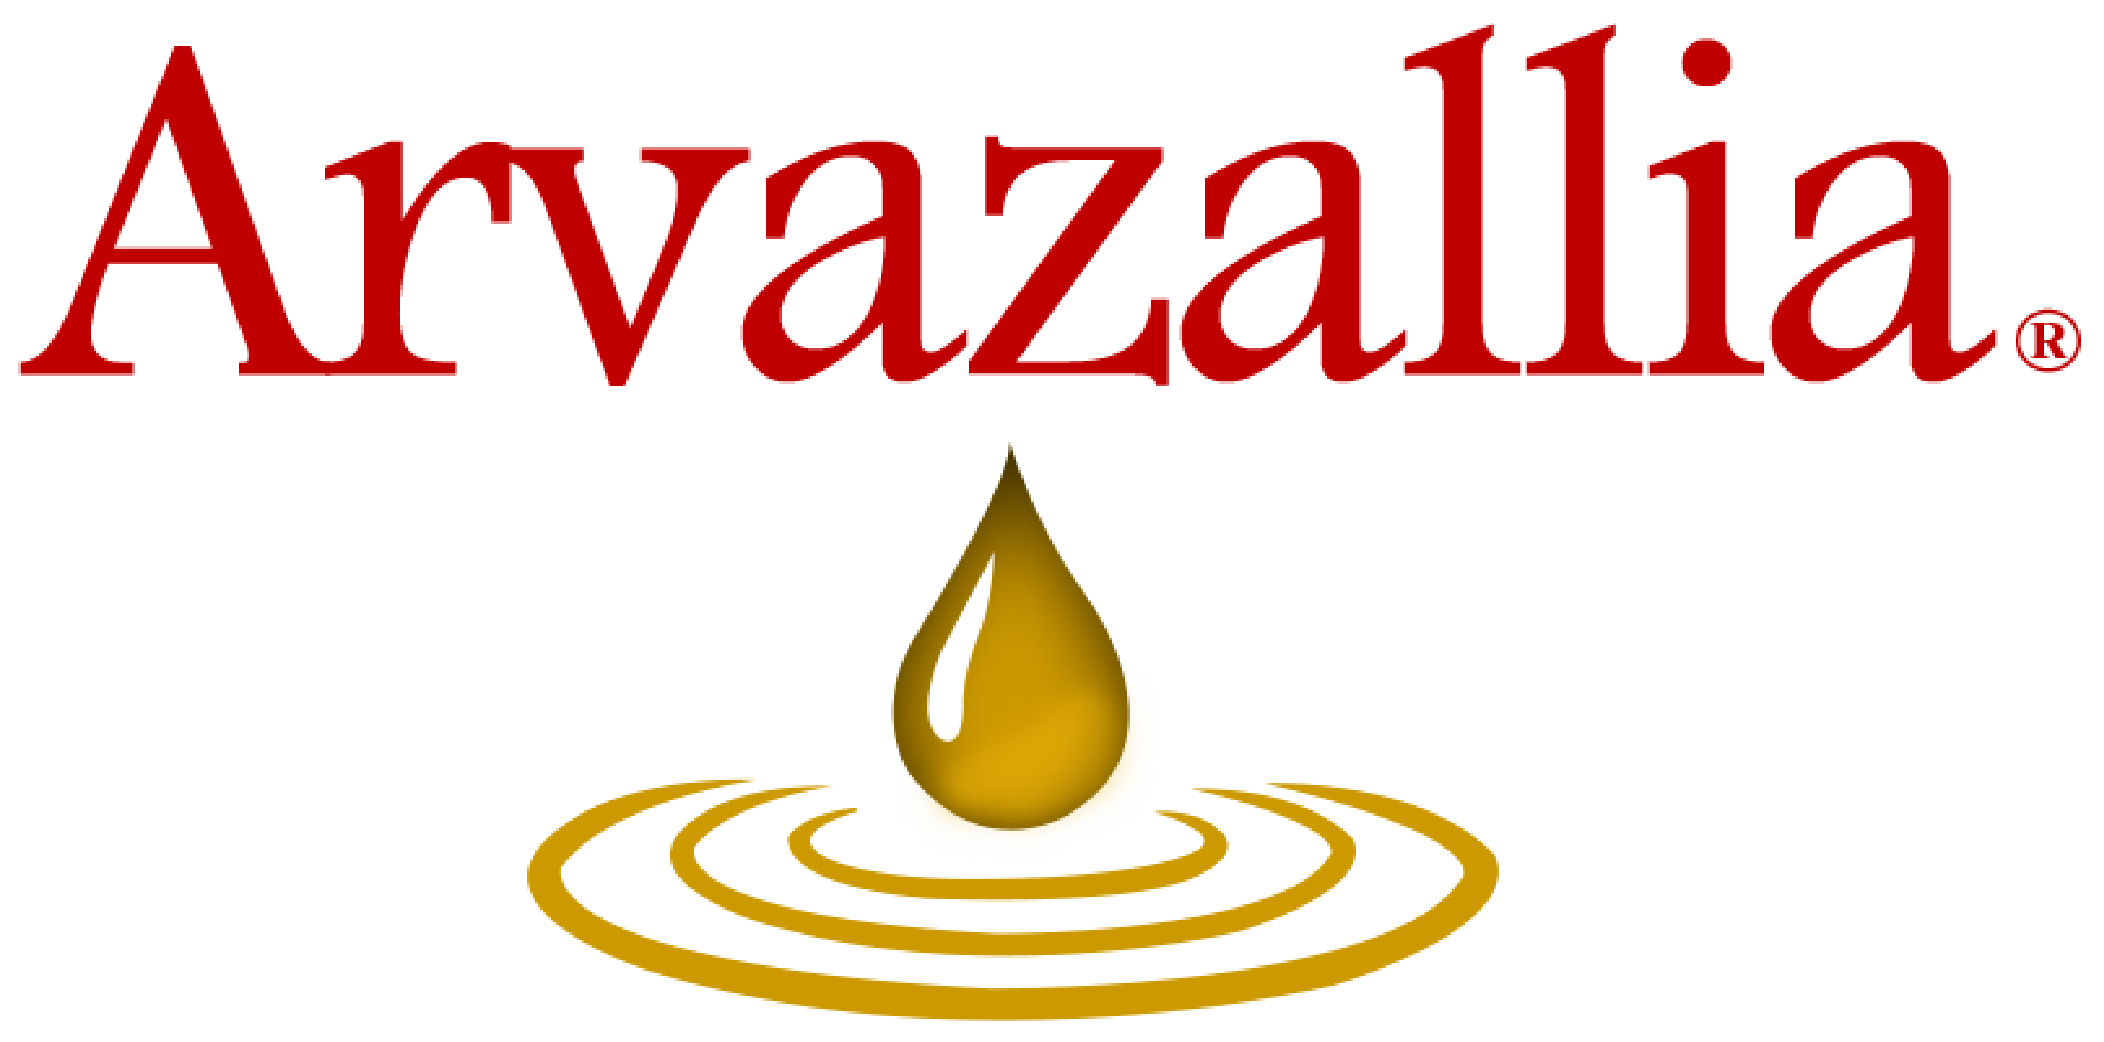 Arvazallia's logo